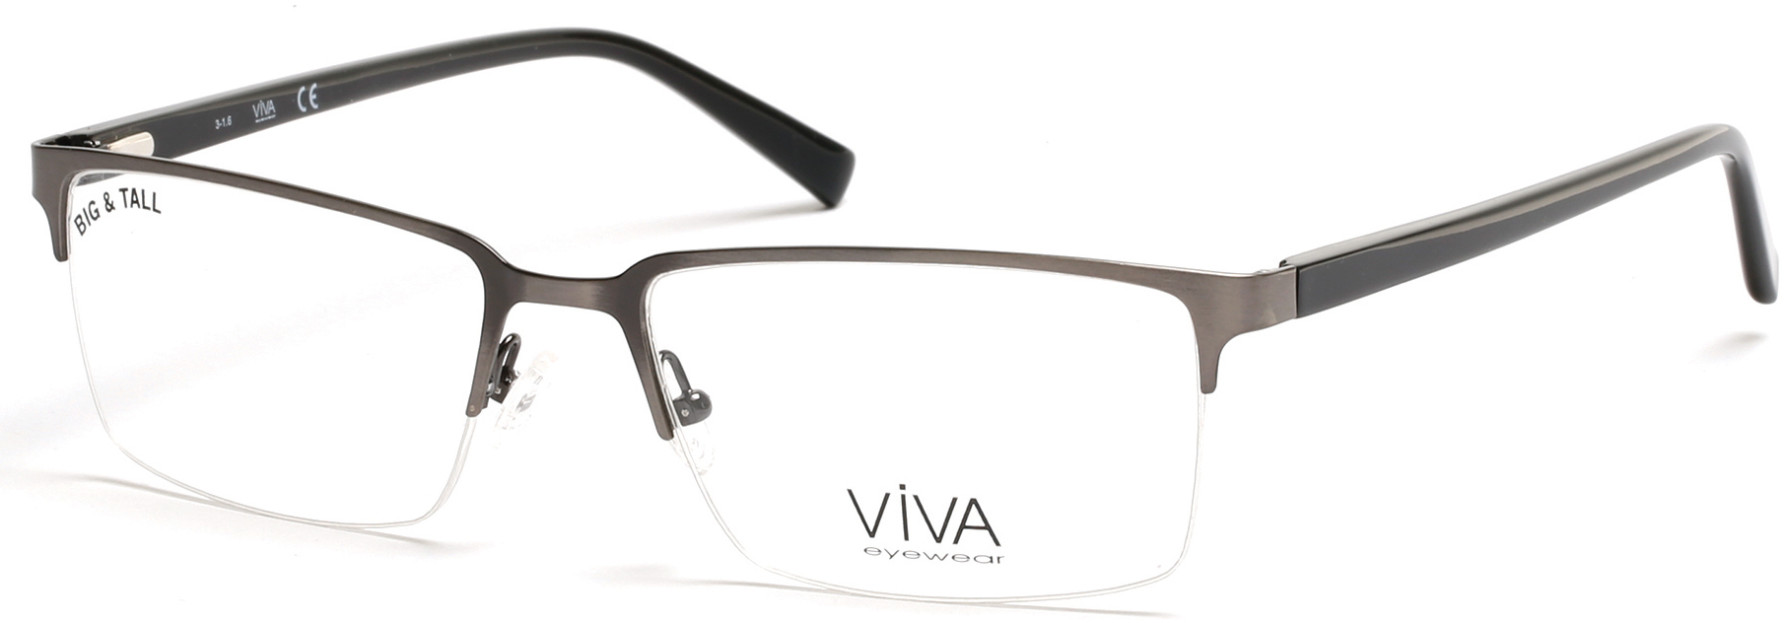 VIVA VV4025 style-color 009 - Matte Gunmetal